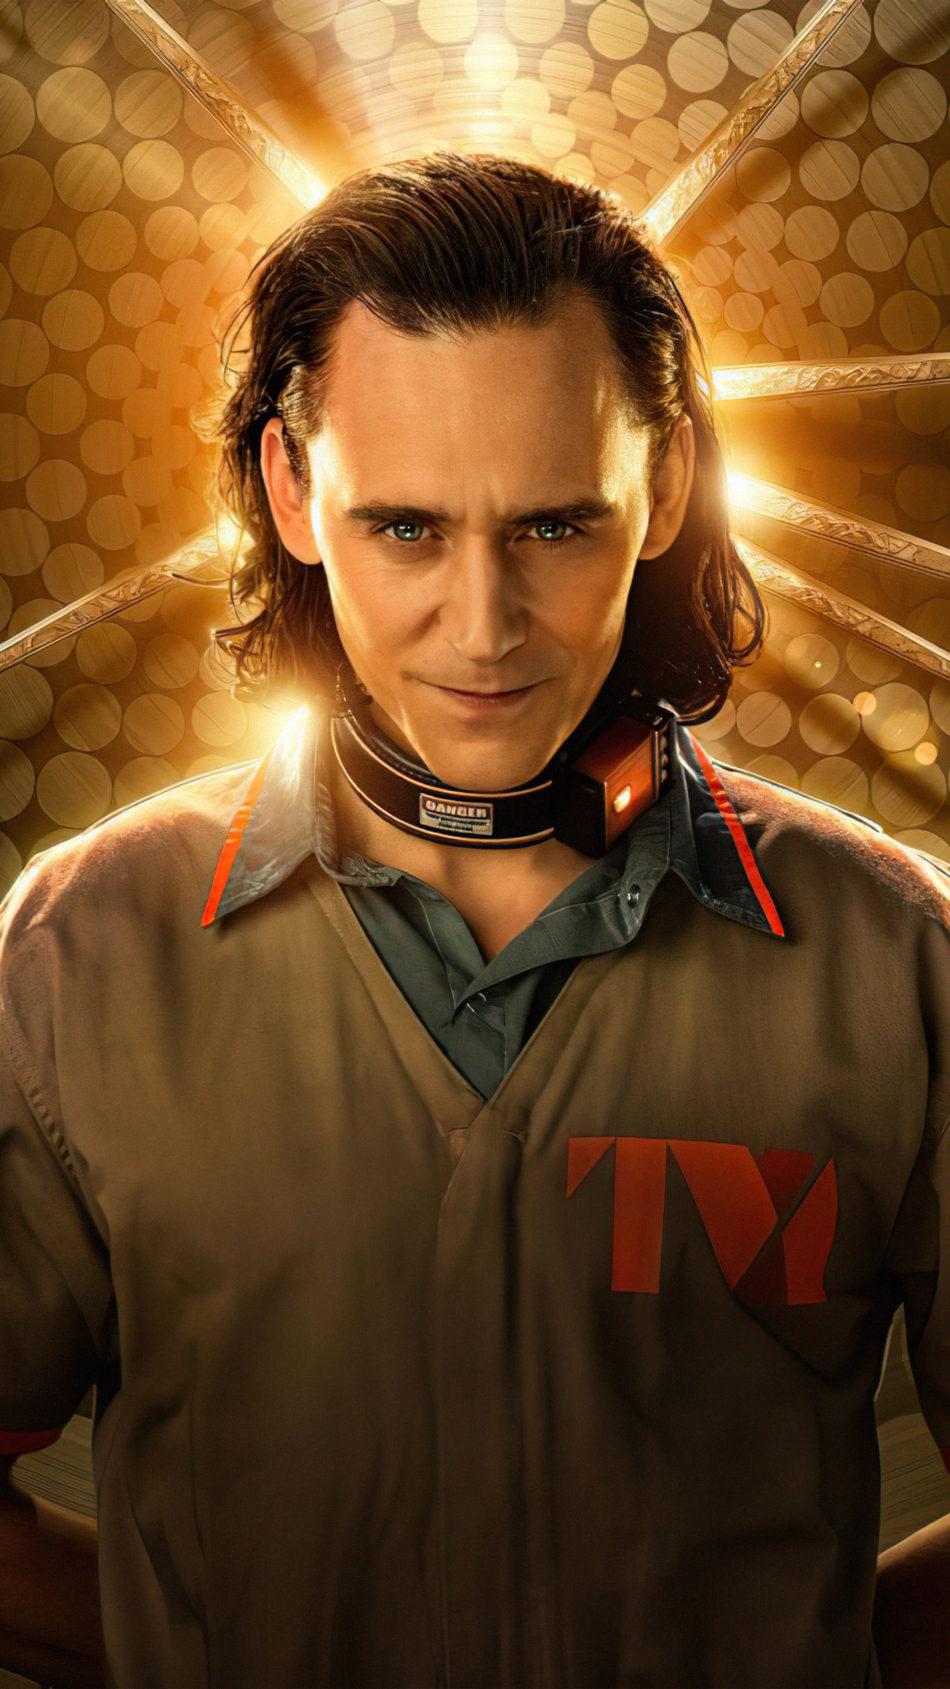 Marvel Studios Loki 4K Ultra HD Mobile Wallpaper